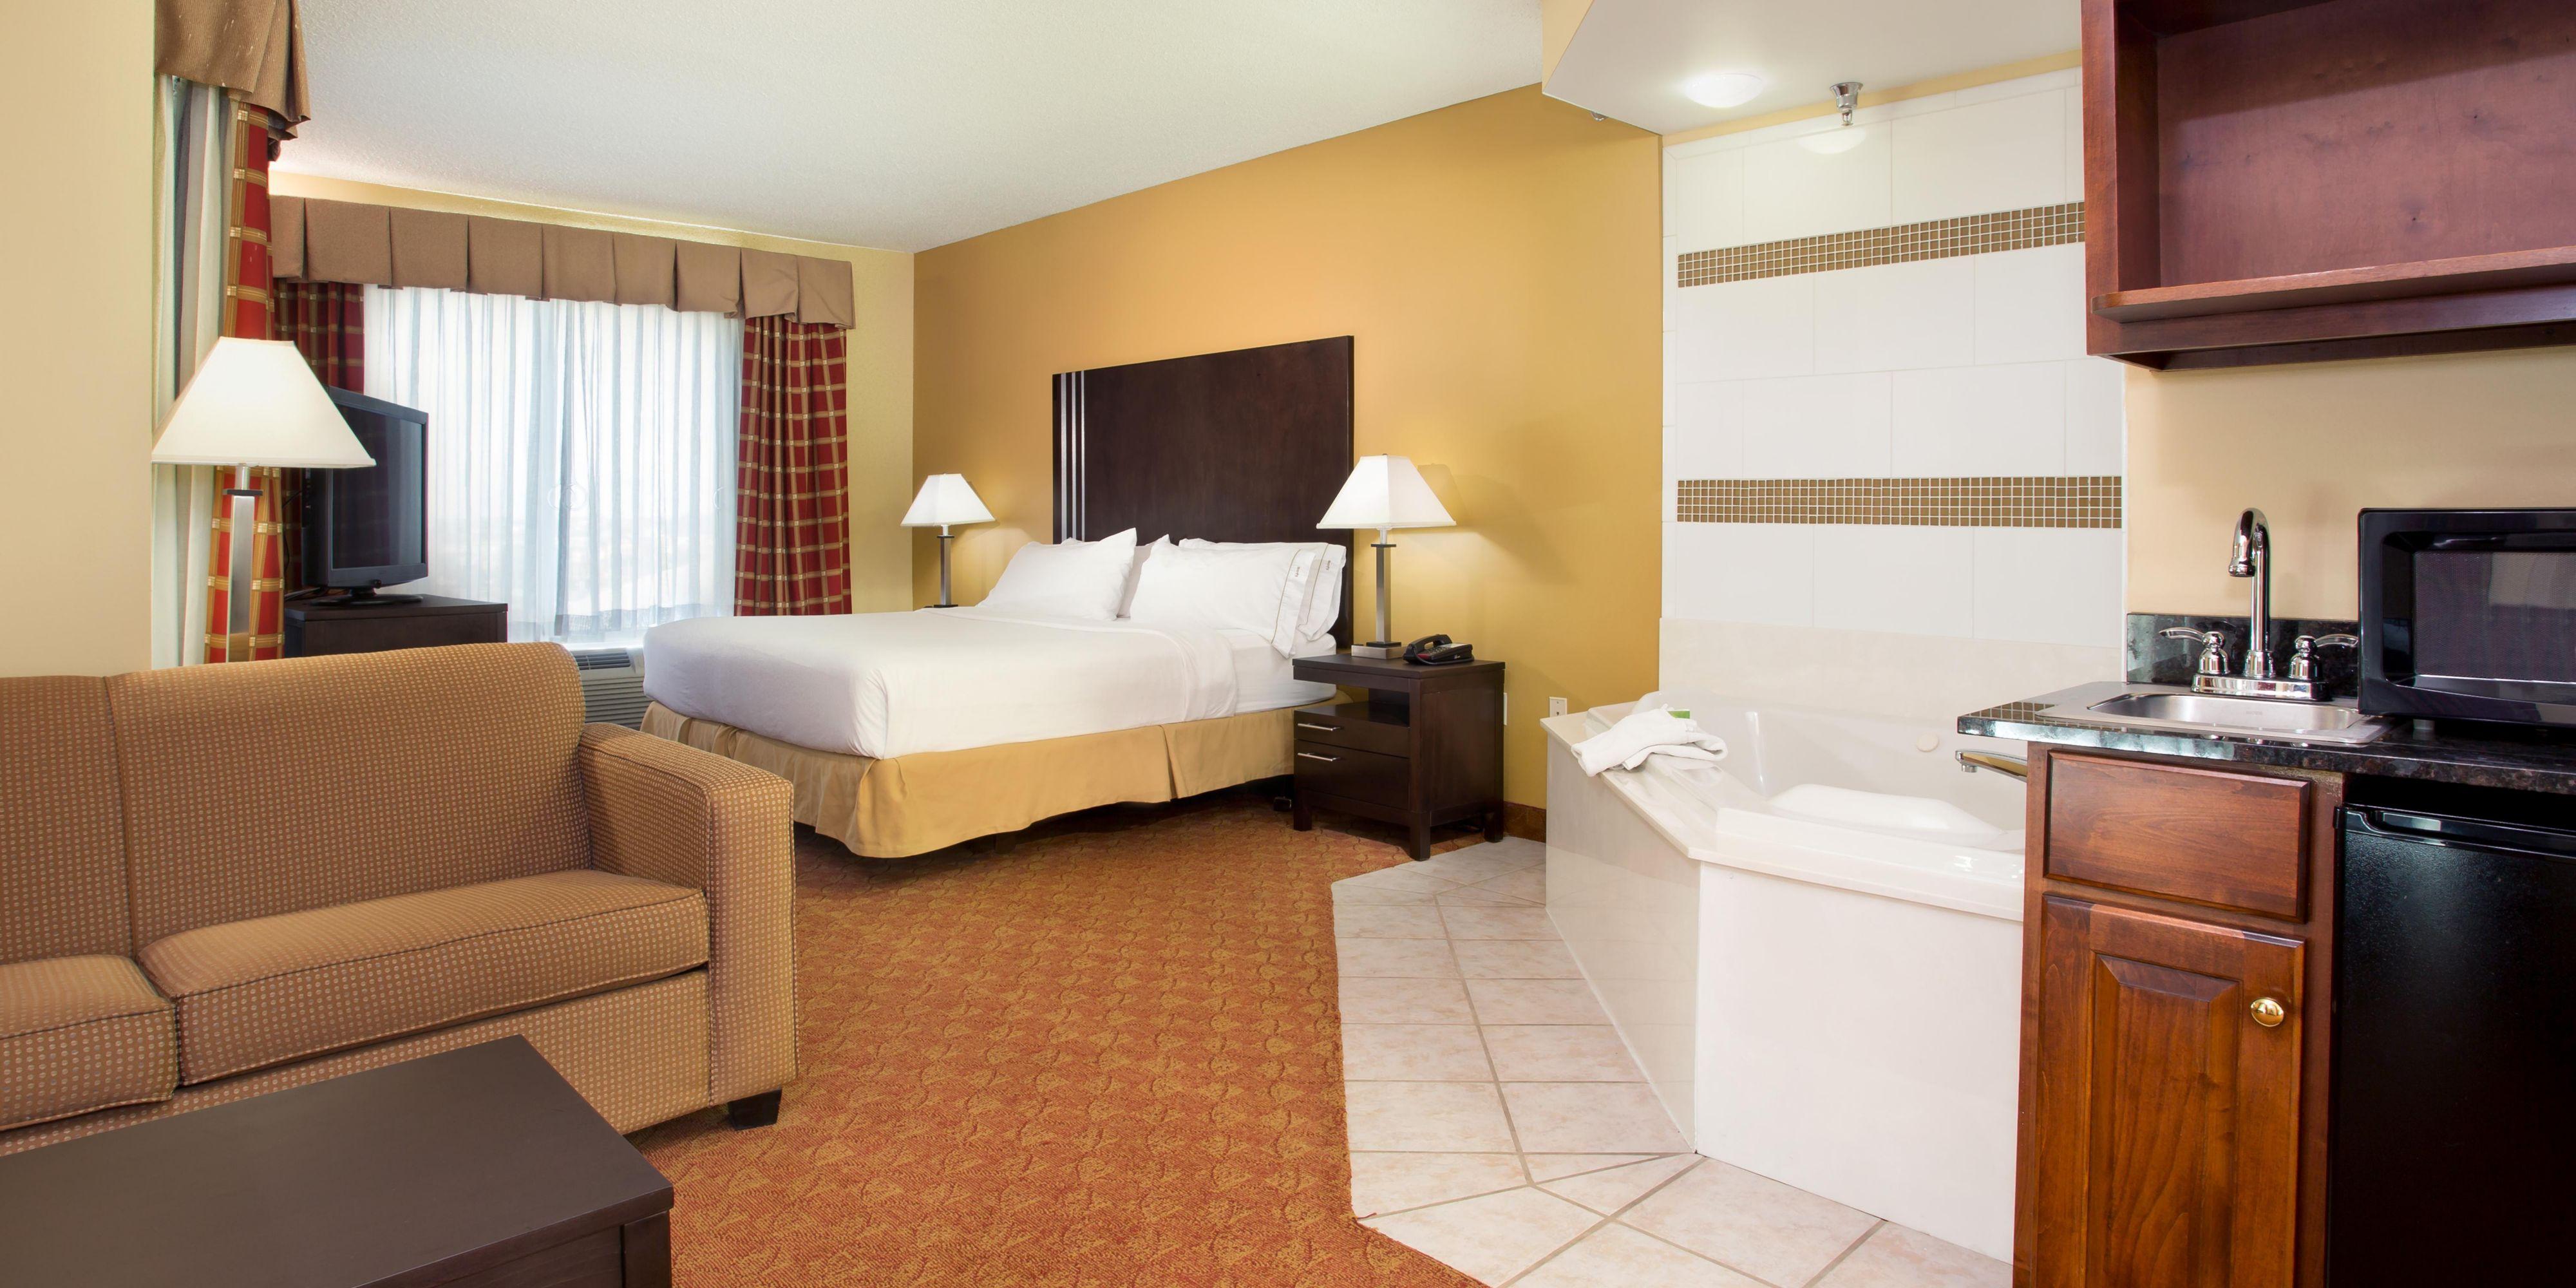 Holiday Inn Express U0026 Suites Richmond Hotel By IHG